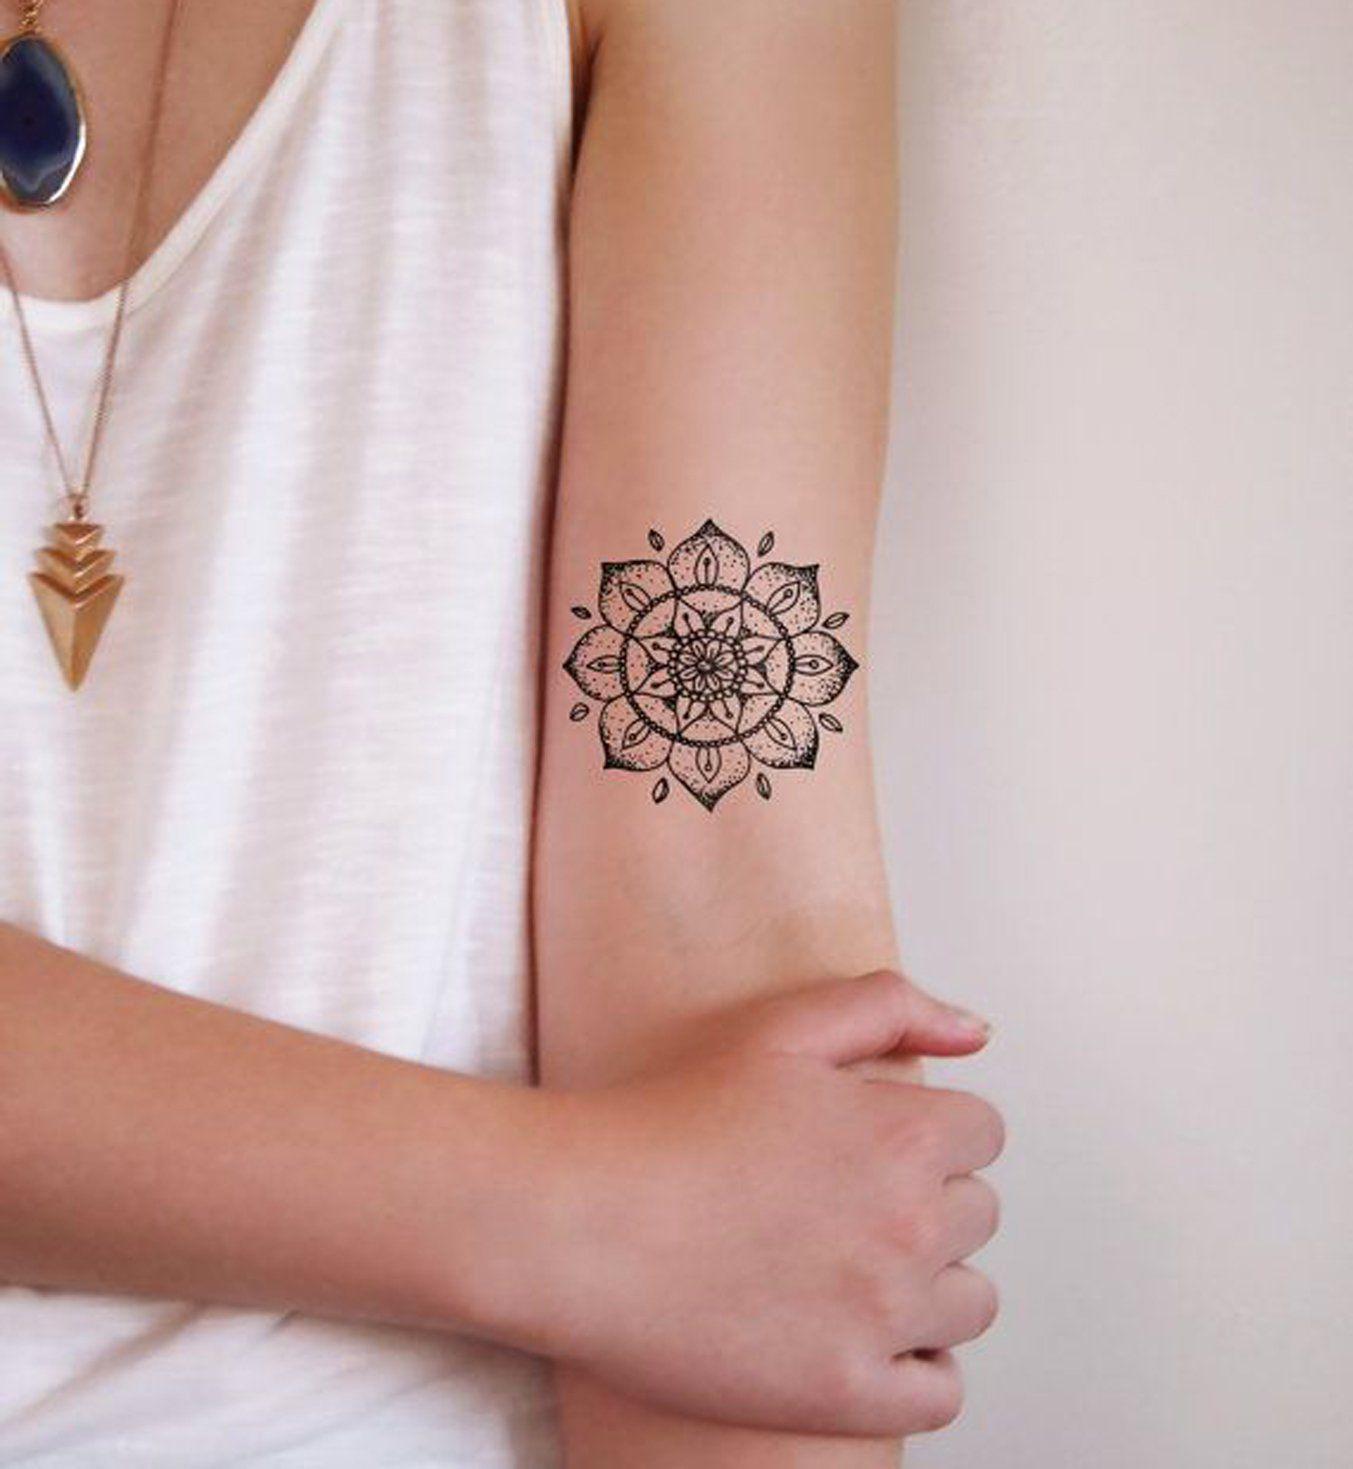 13 tatouages de mandalas qui vont vous donner des id es my life mandala tattoo design. Black Bedroom Furniture Sets. Home Design Ideas